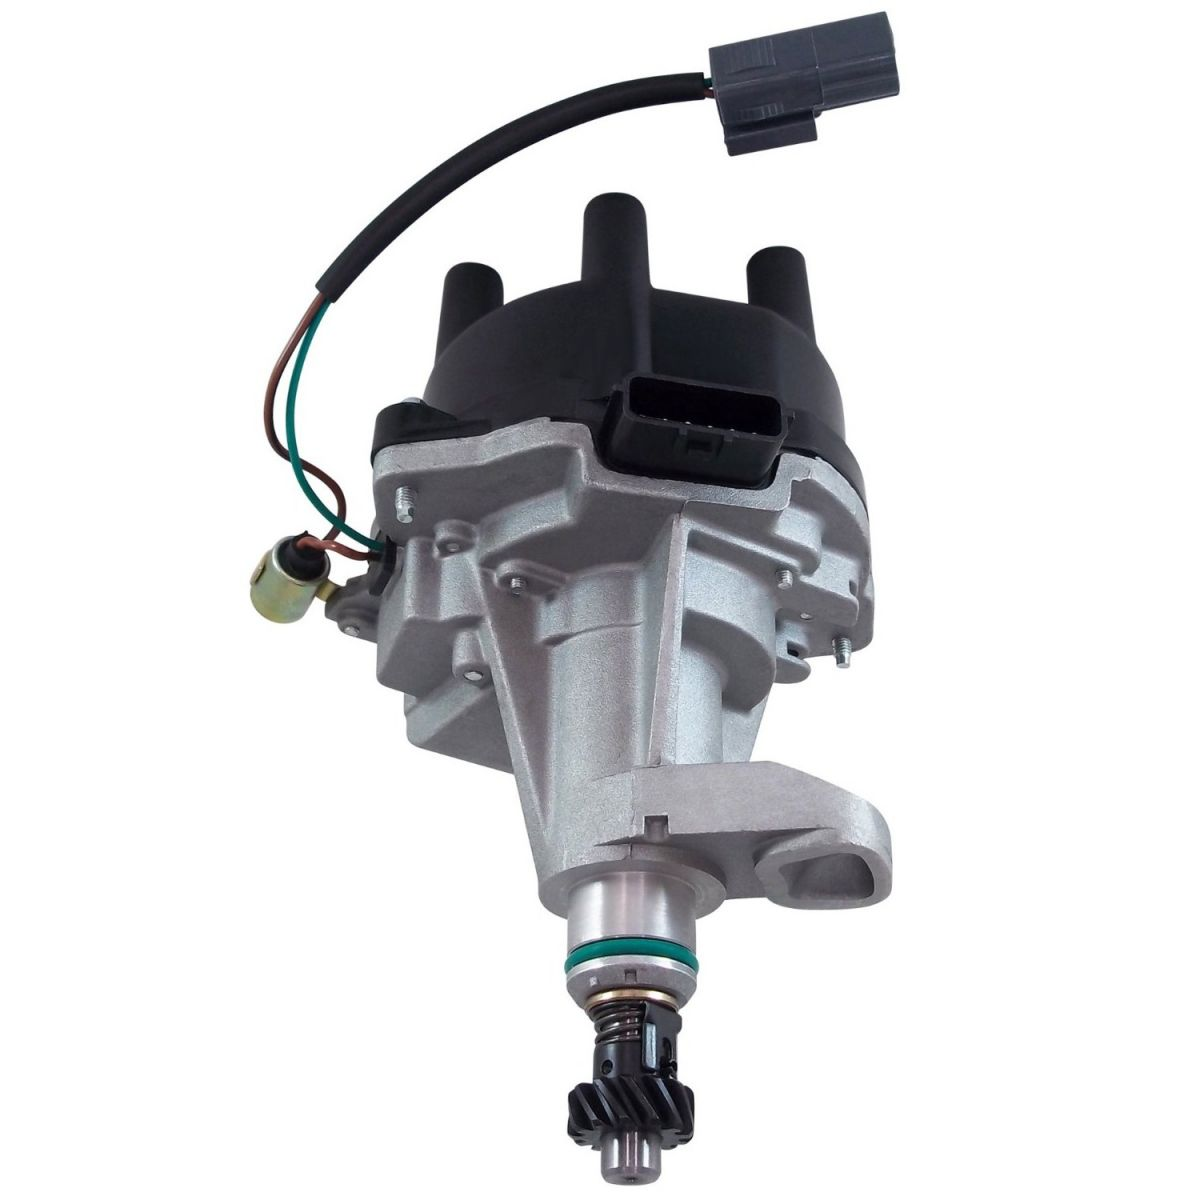 Distribuidor Ignicao Nissan Pathfinder 3.3 V6 Sohc Gasolina De 1996 À 2000